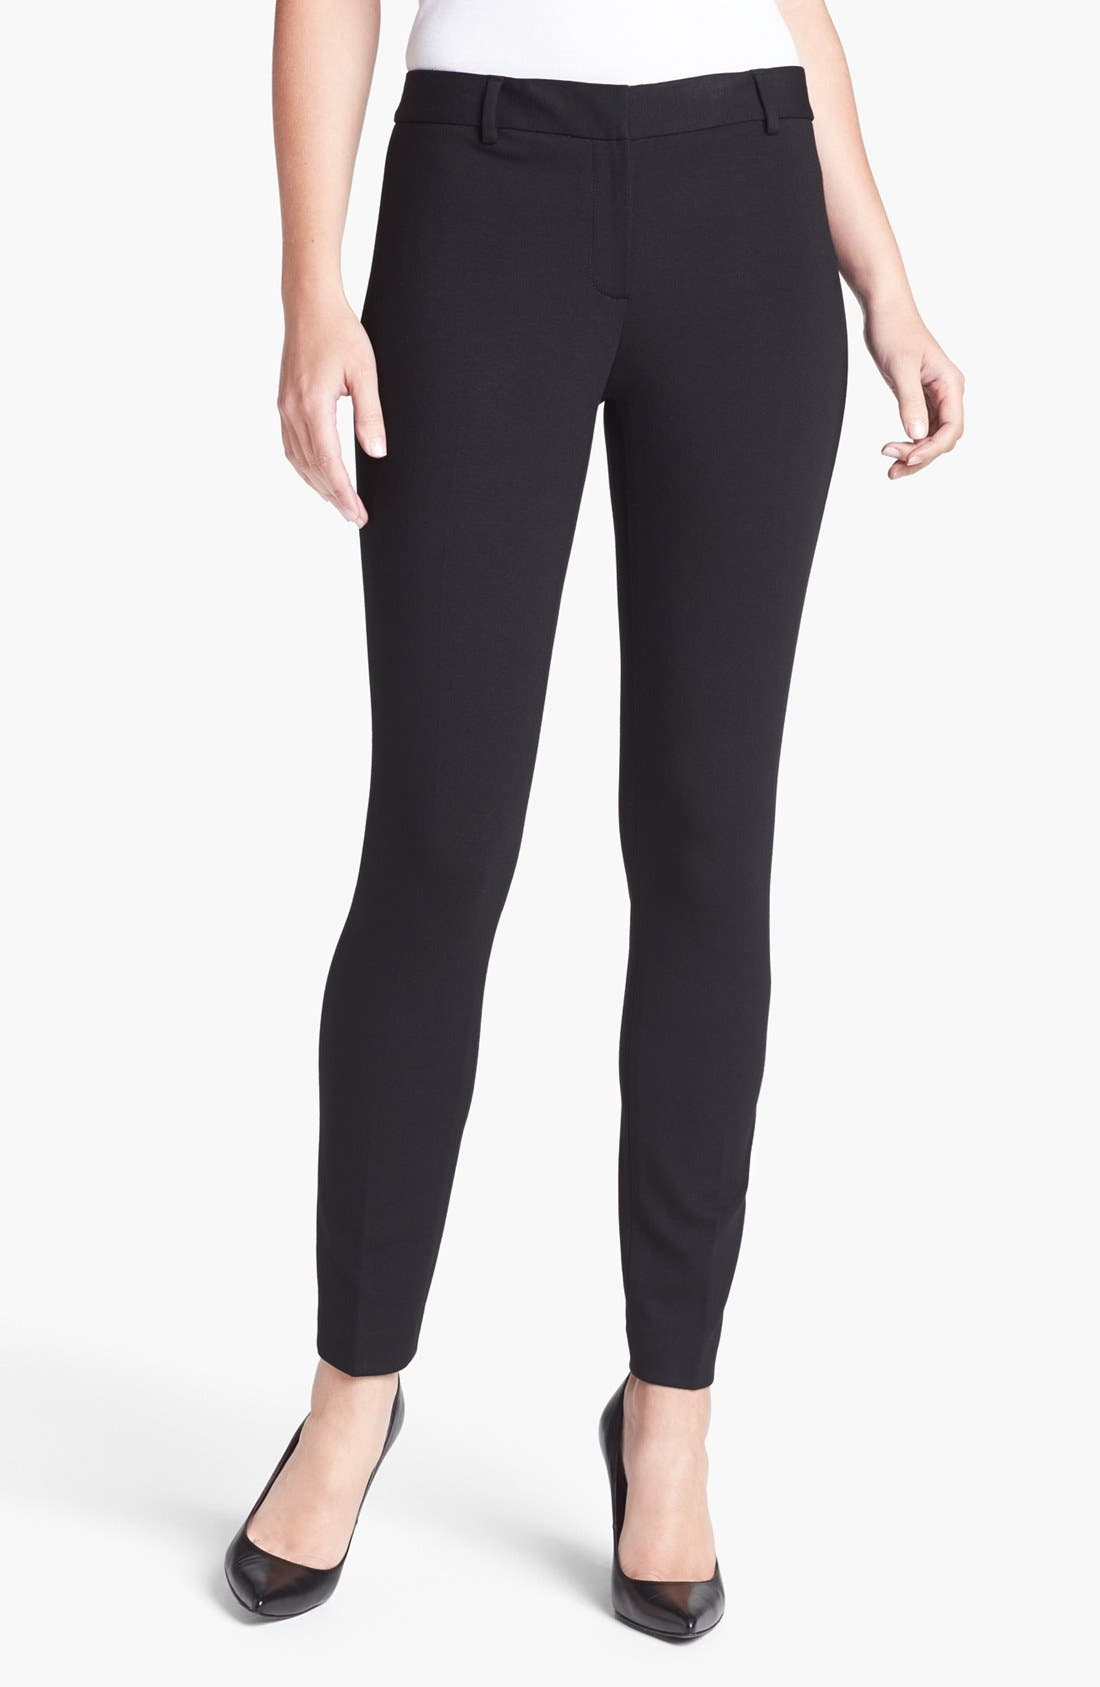 Alternate Image 1 Selected - Elie Tahari 'Verda' Slim Pants